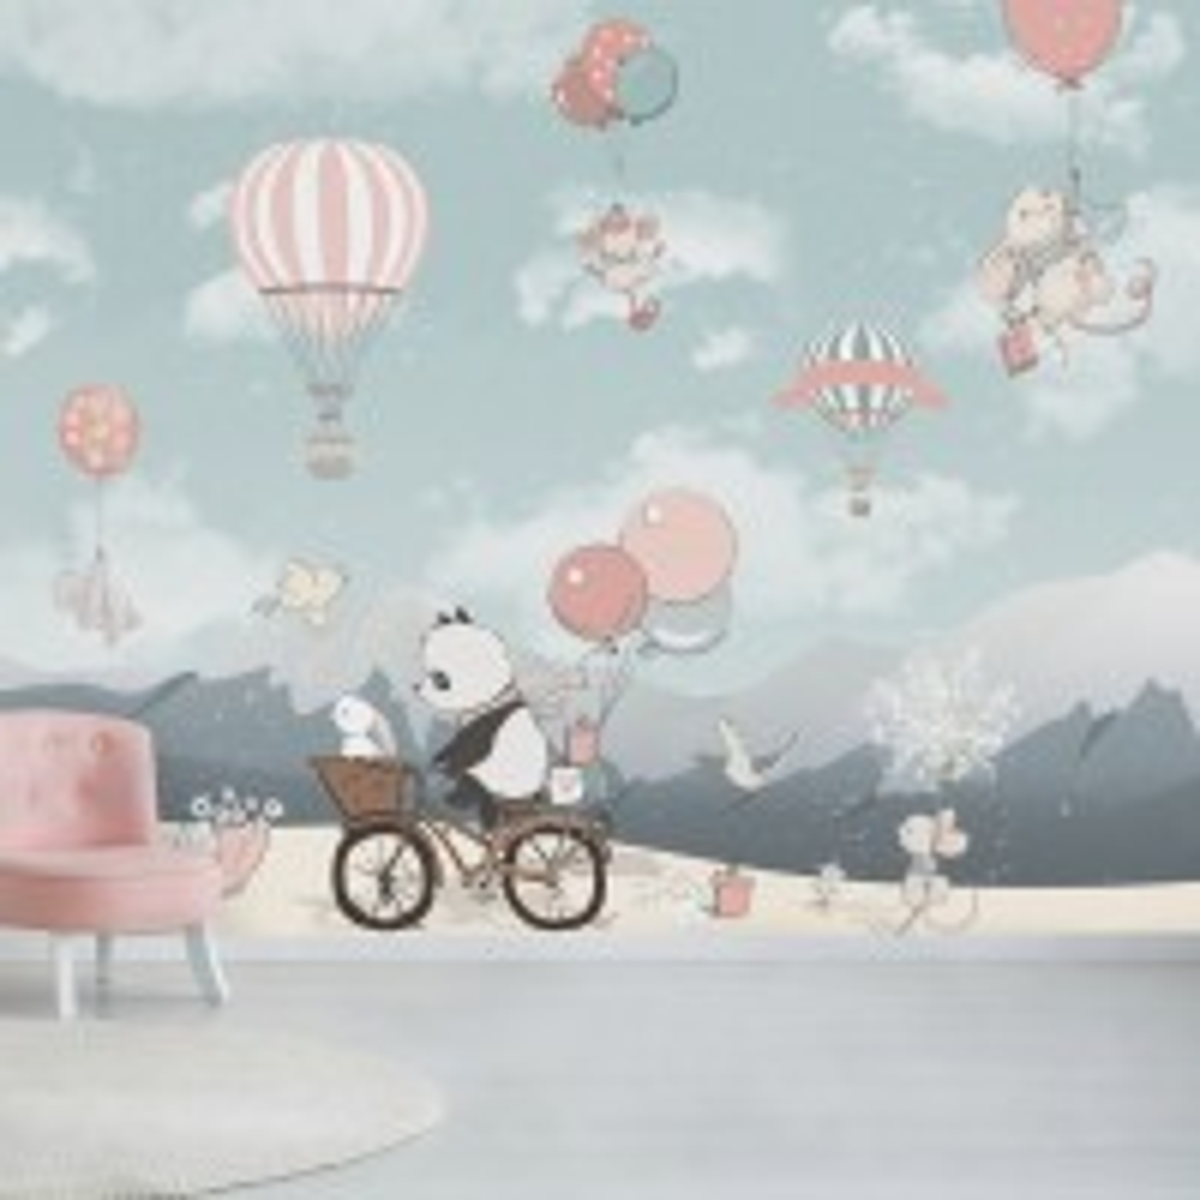 Kids Cute Panda Bicycle with Hot Air Balloon Wallpaper Mural